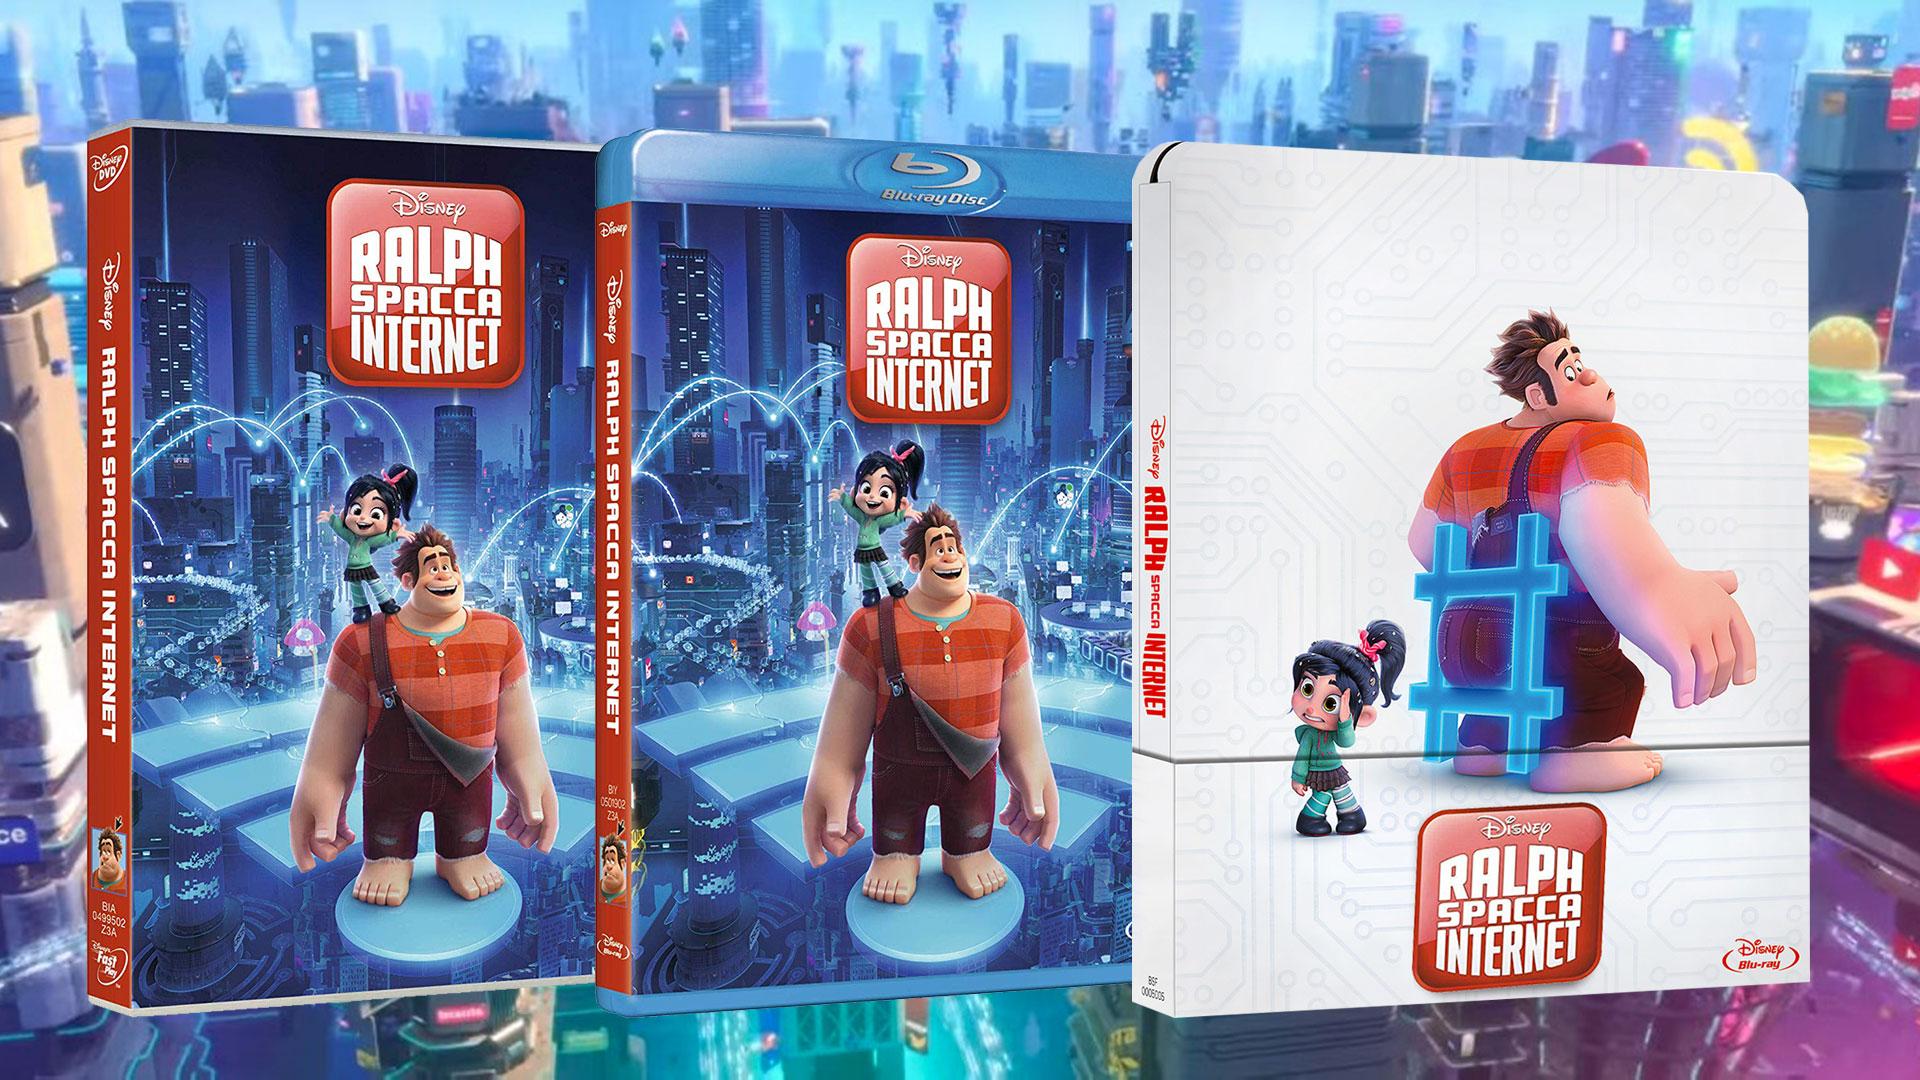 ralph spacca internet dvd  Ralph Spacca Internet Blu-ray: data di uscita, pack e contenuti extra